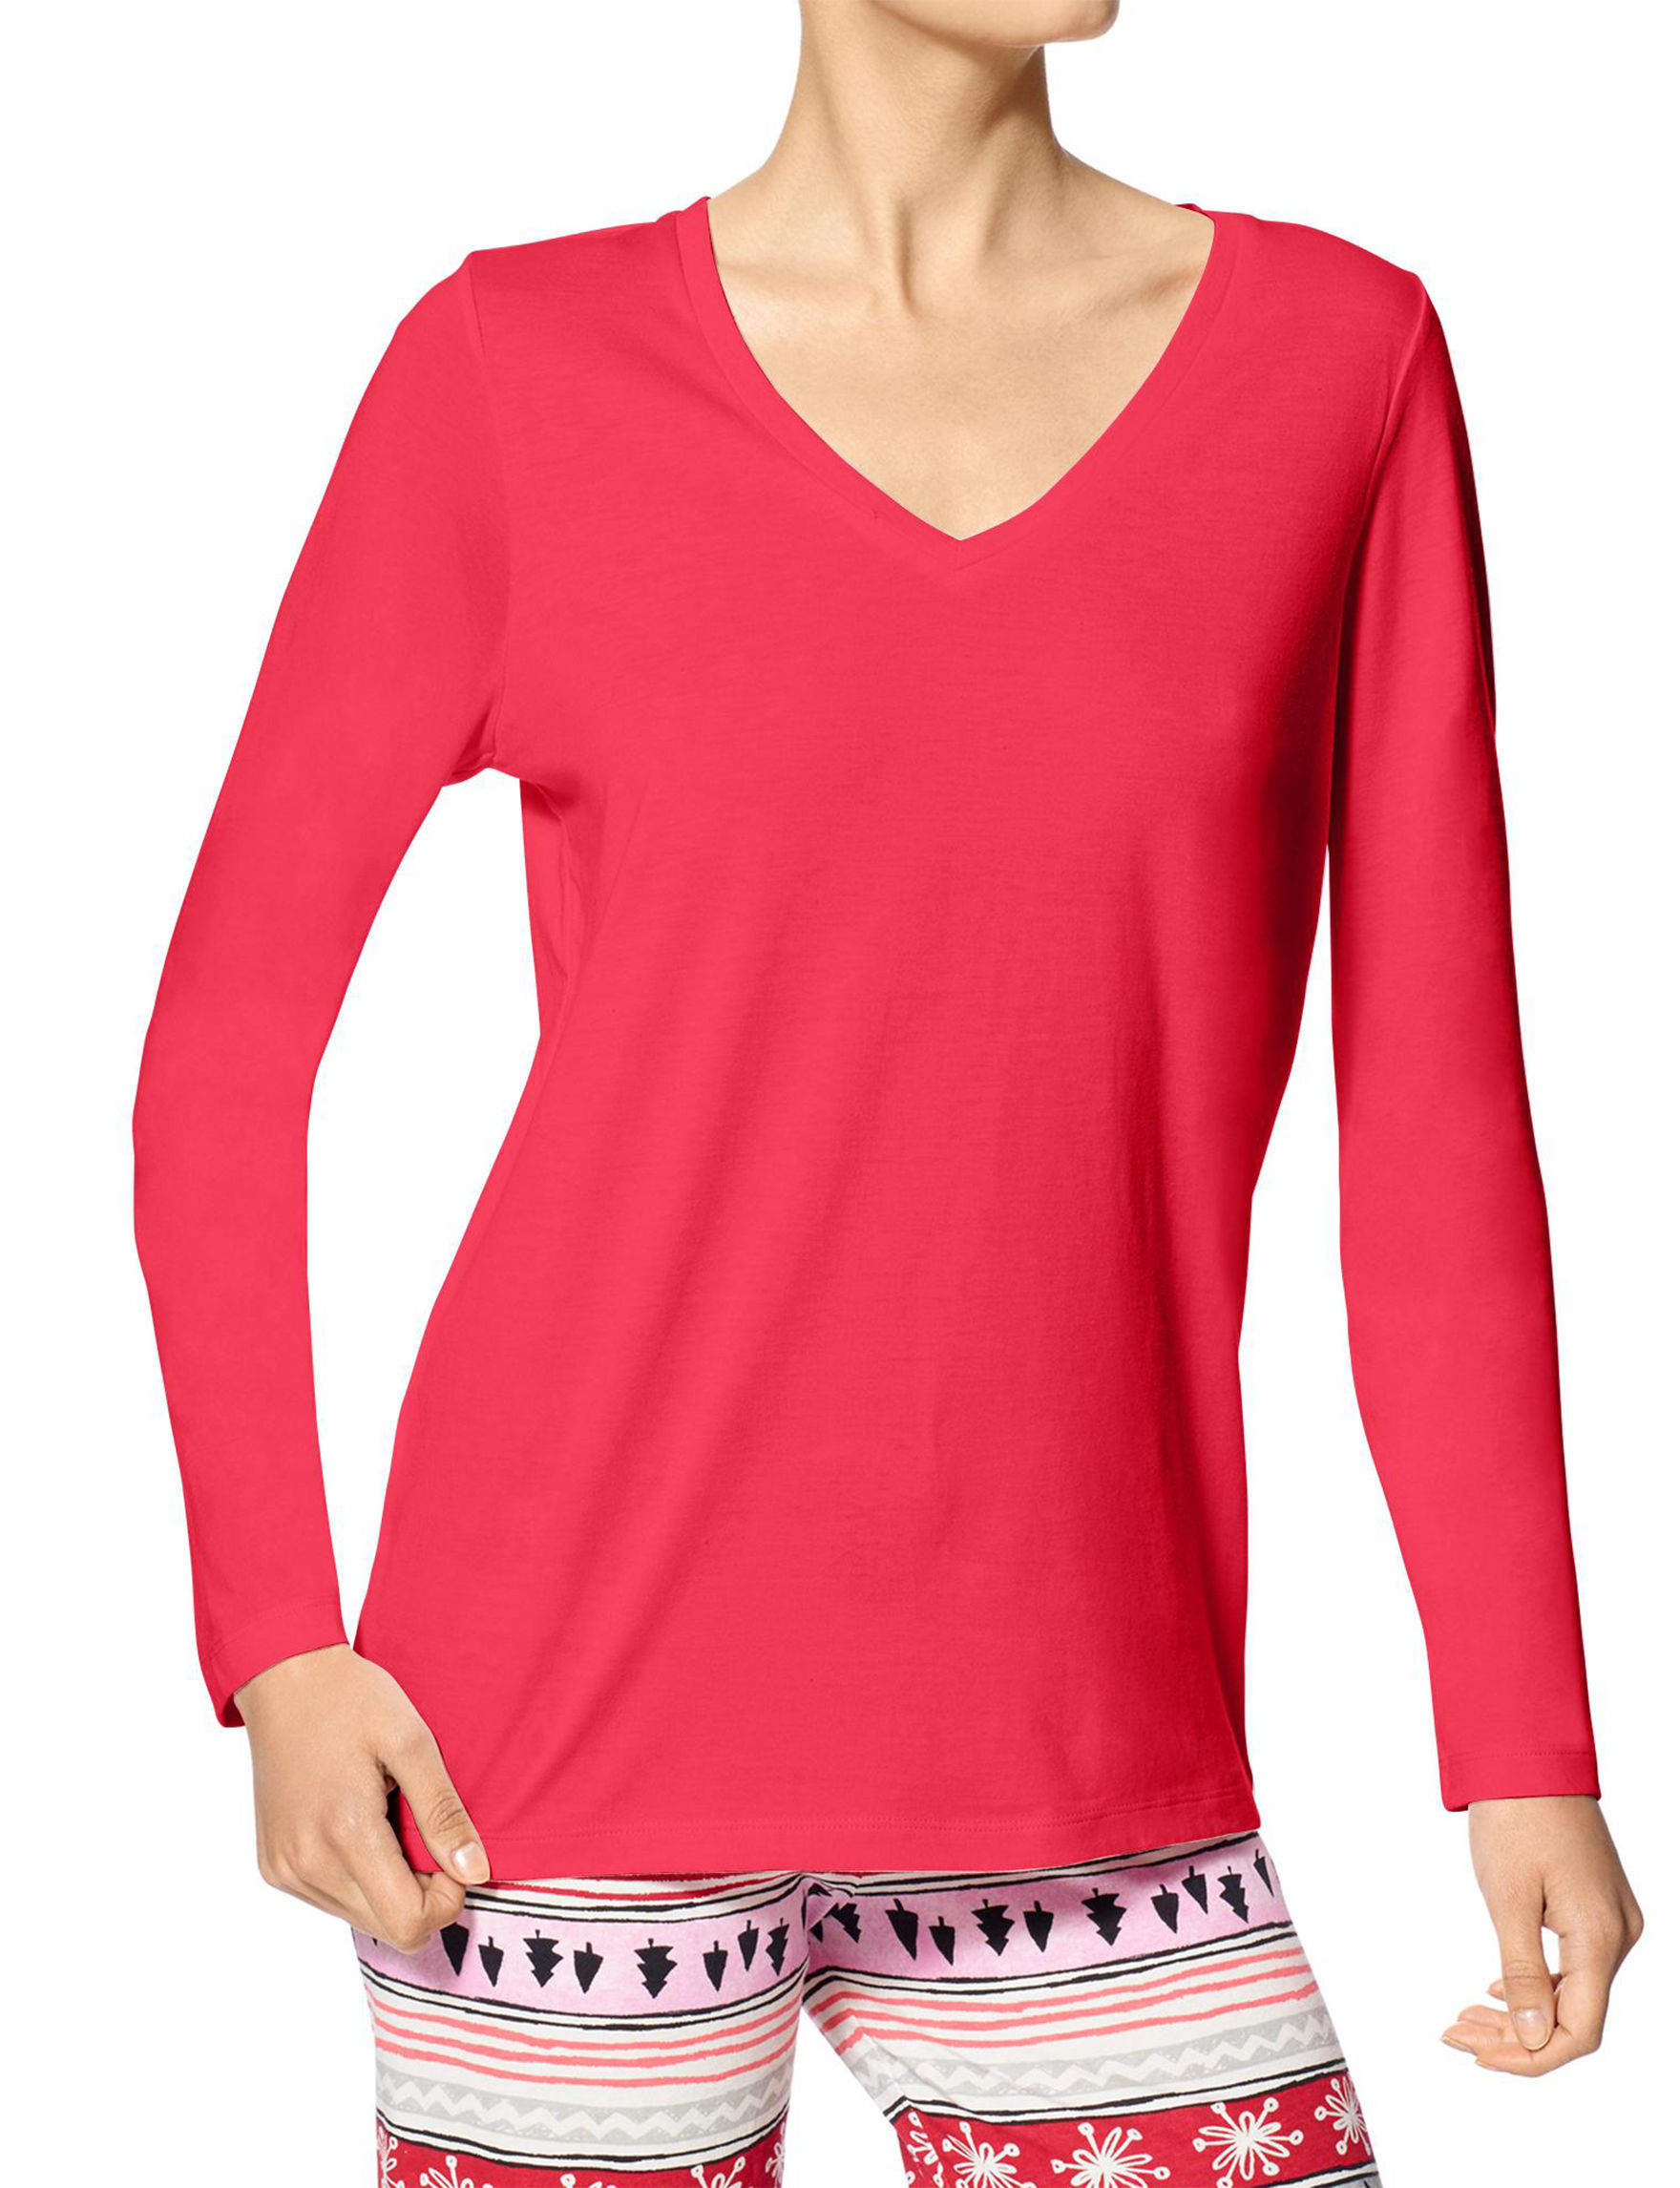 Hue Red Nightgowns & Sleep Shirts